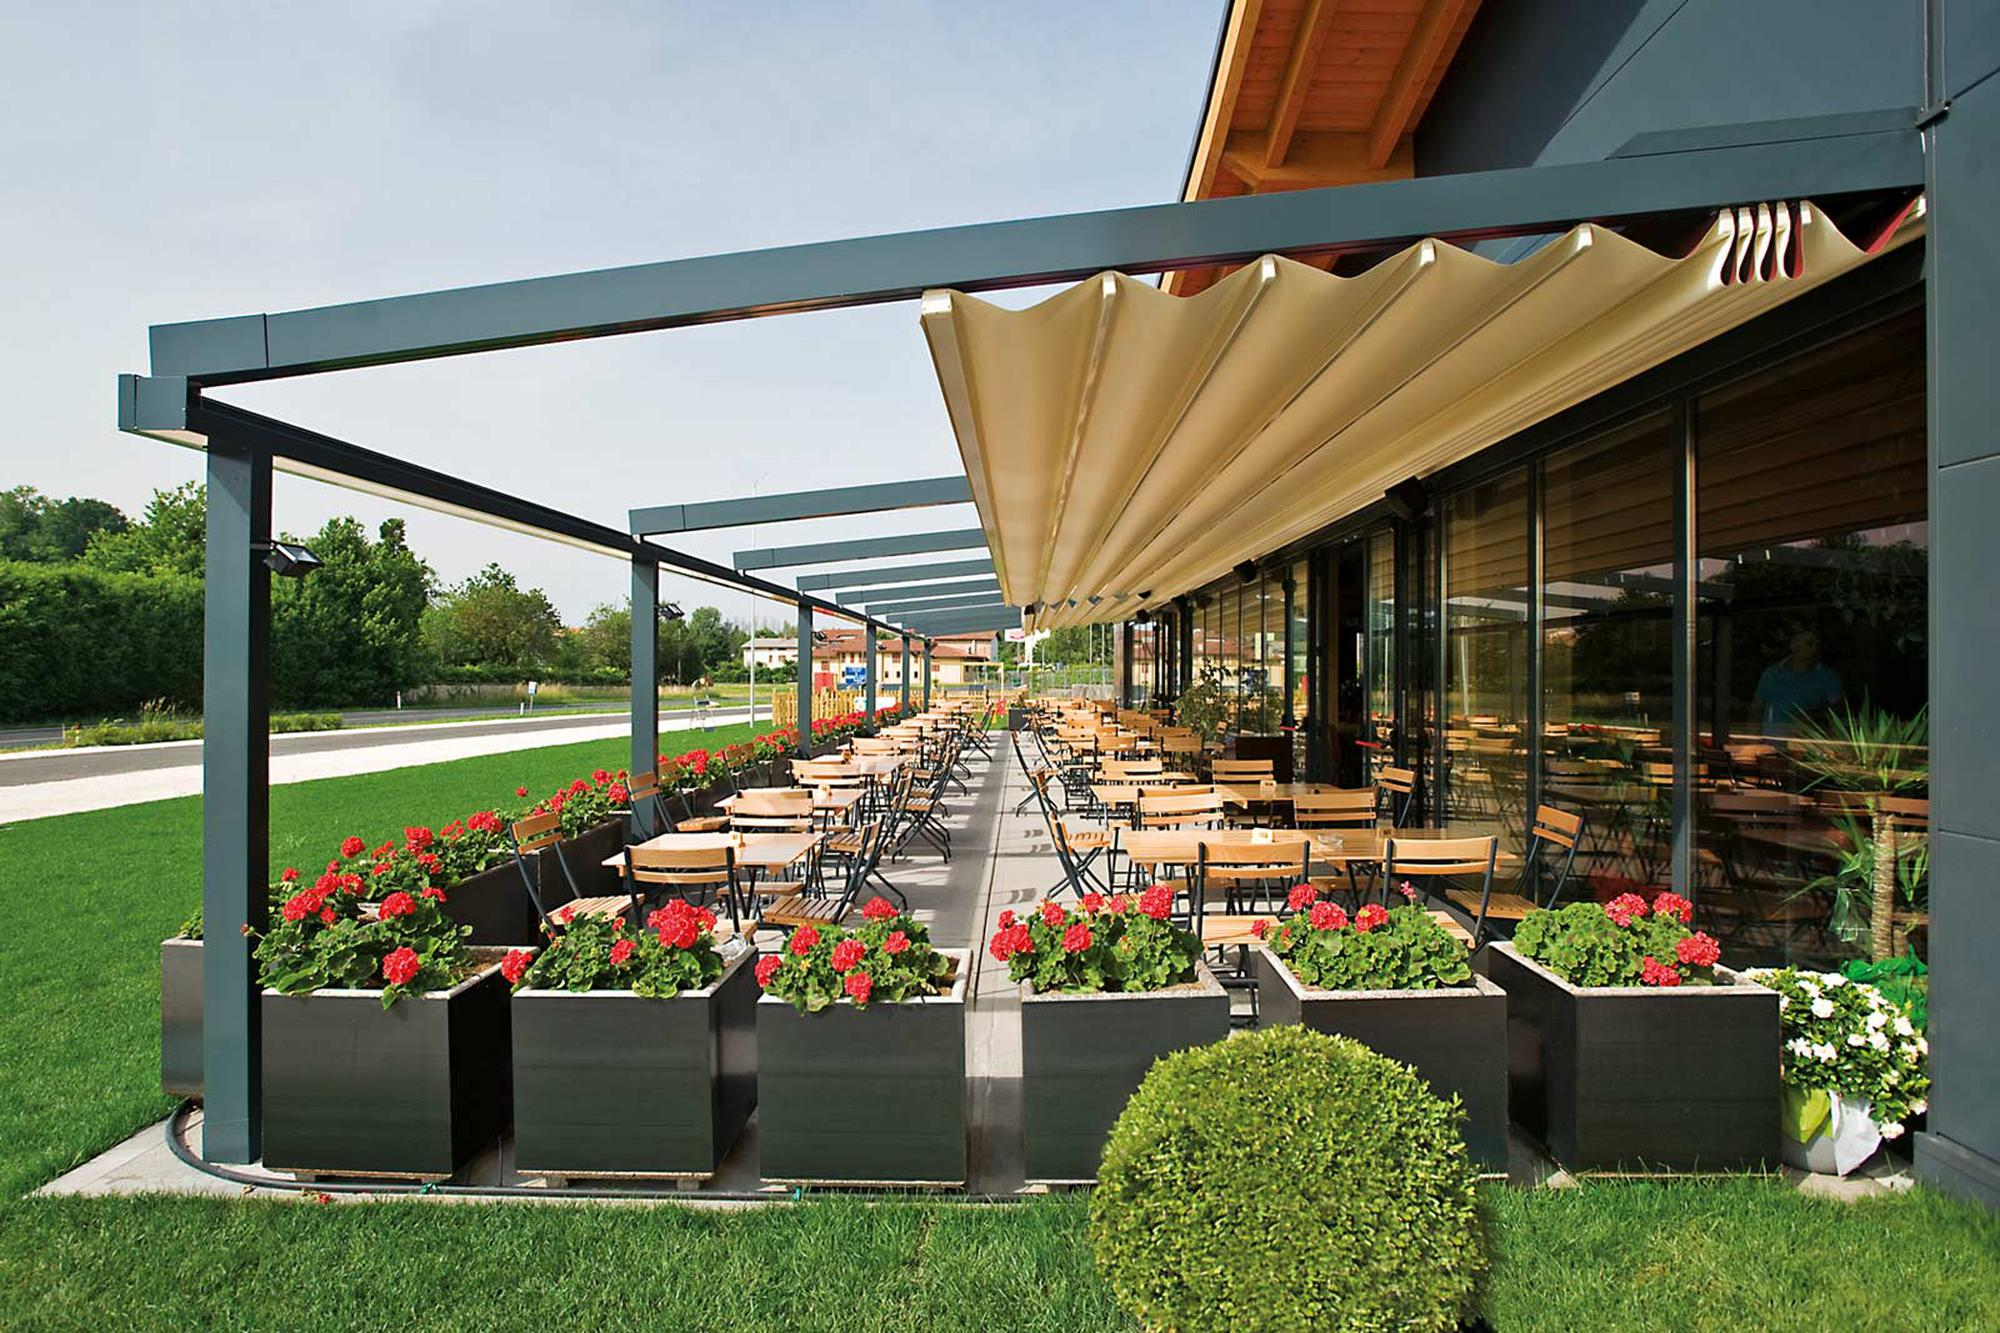 Retractable Deck Pergola Canopy |The Sassari Patio Cover